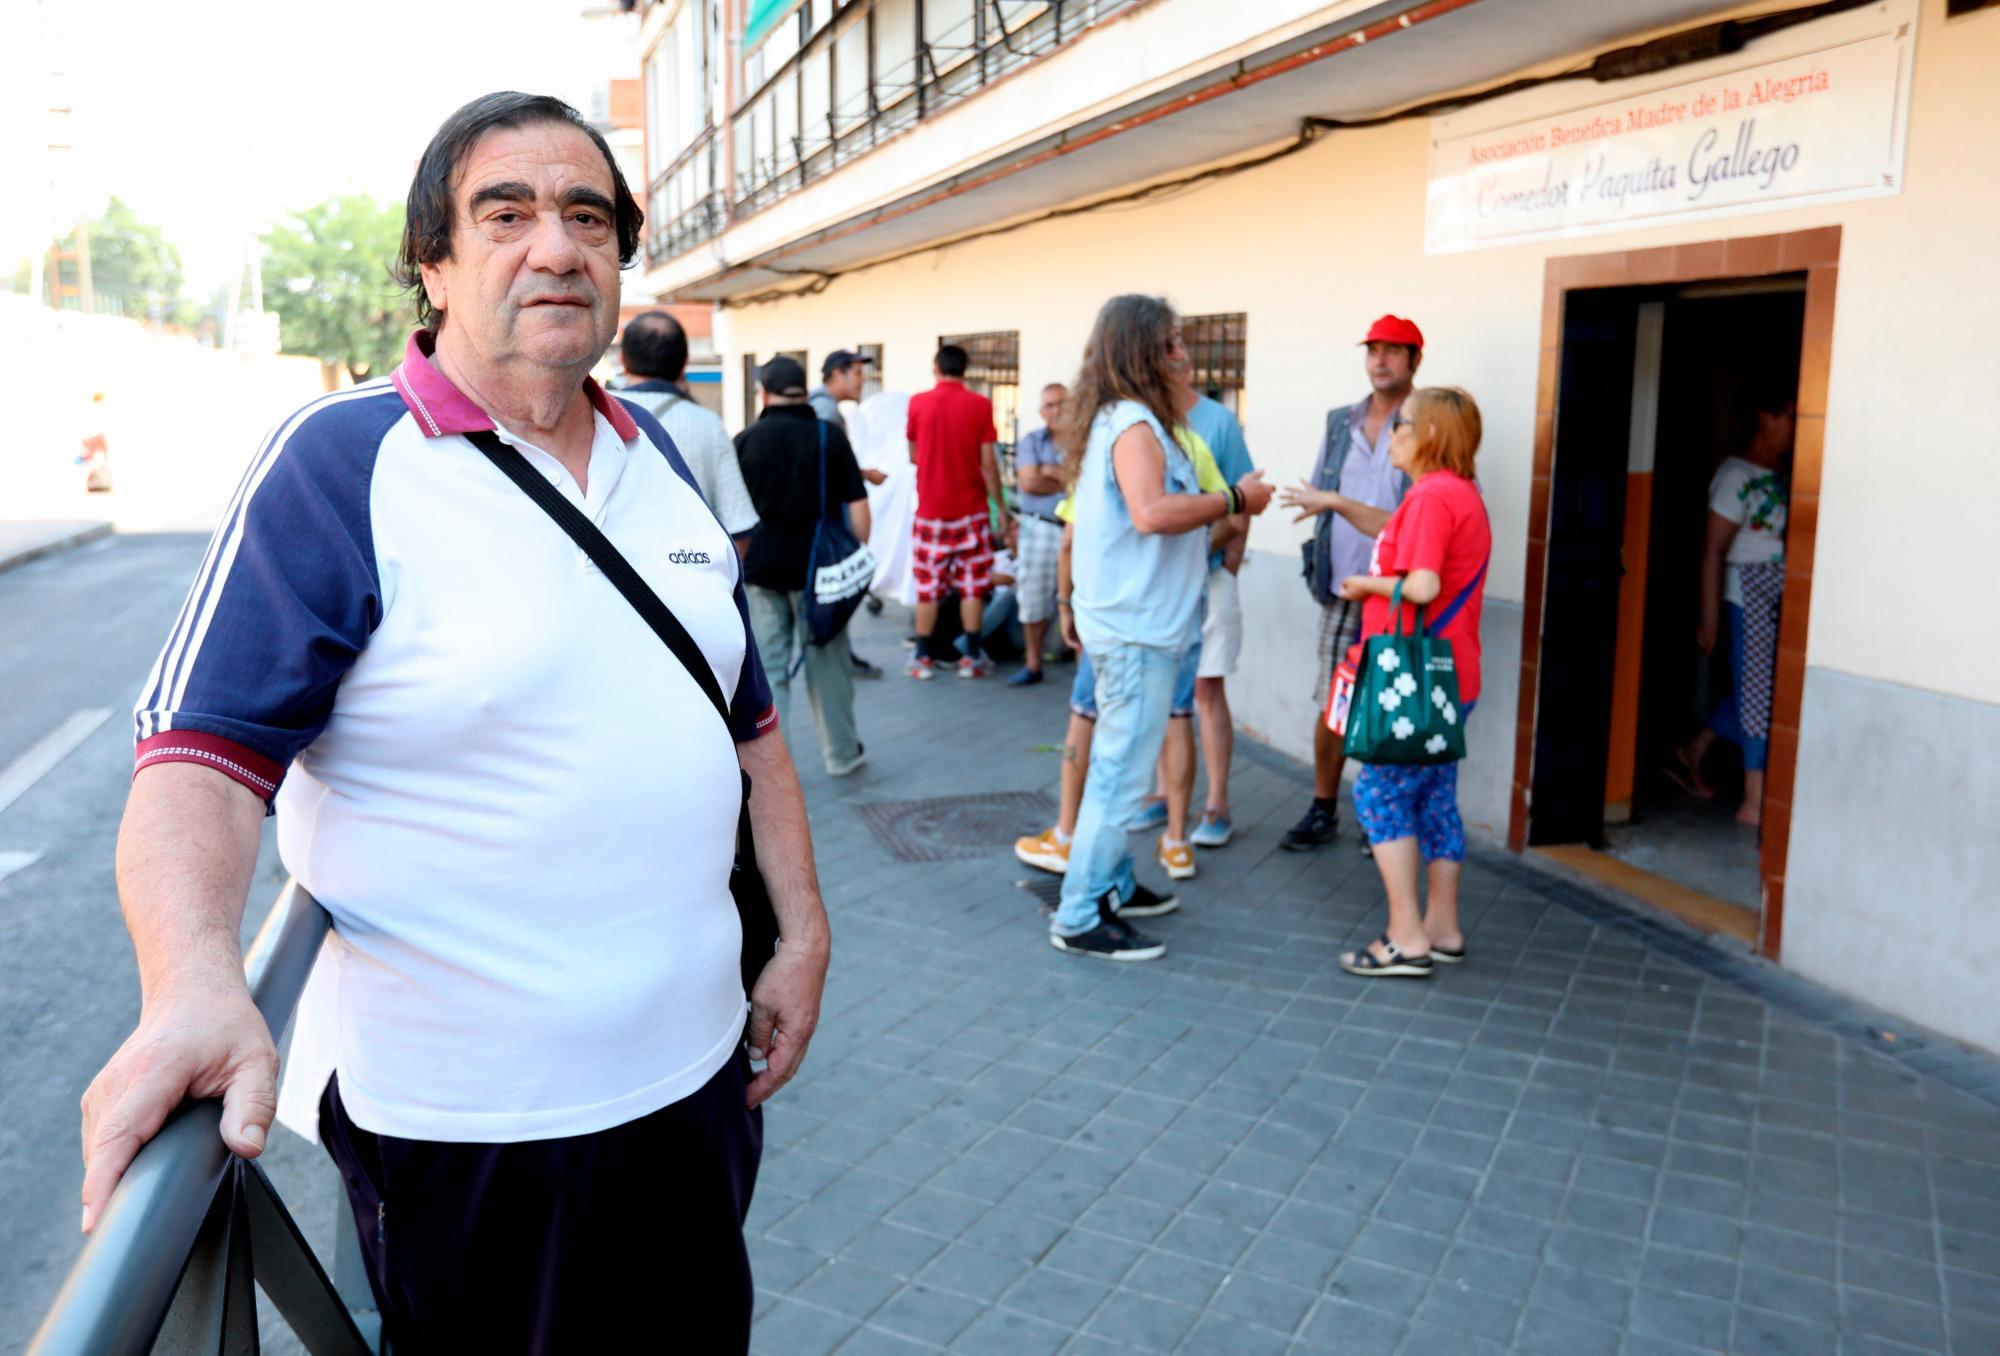 "Resultado de imagen de Comedor de Paquita Gallego."""